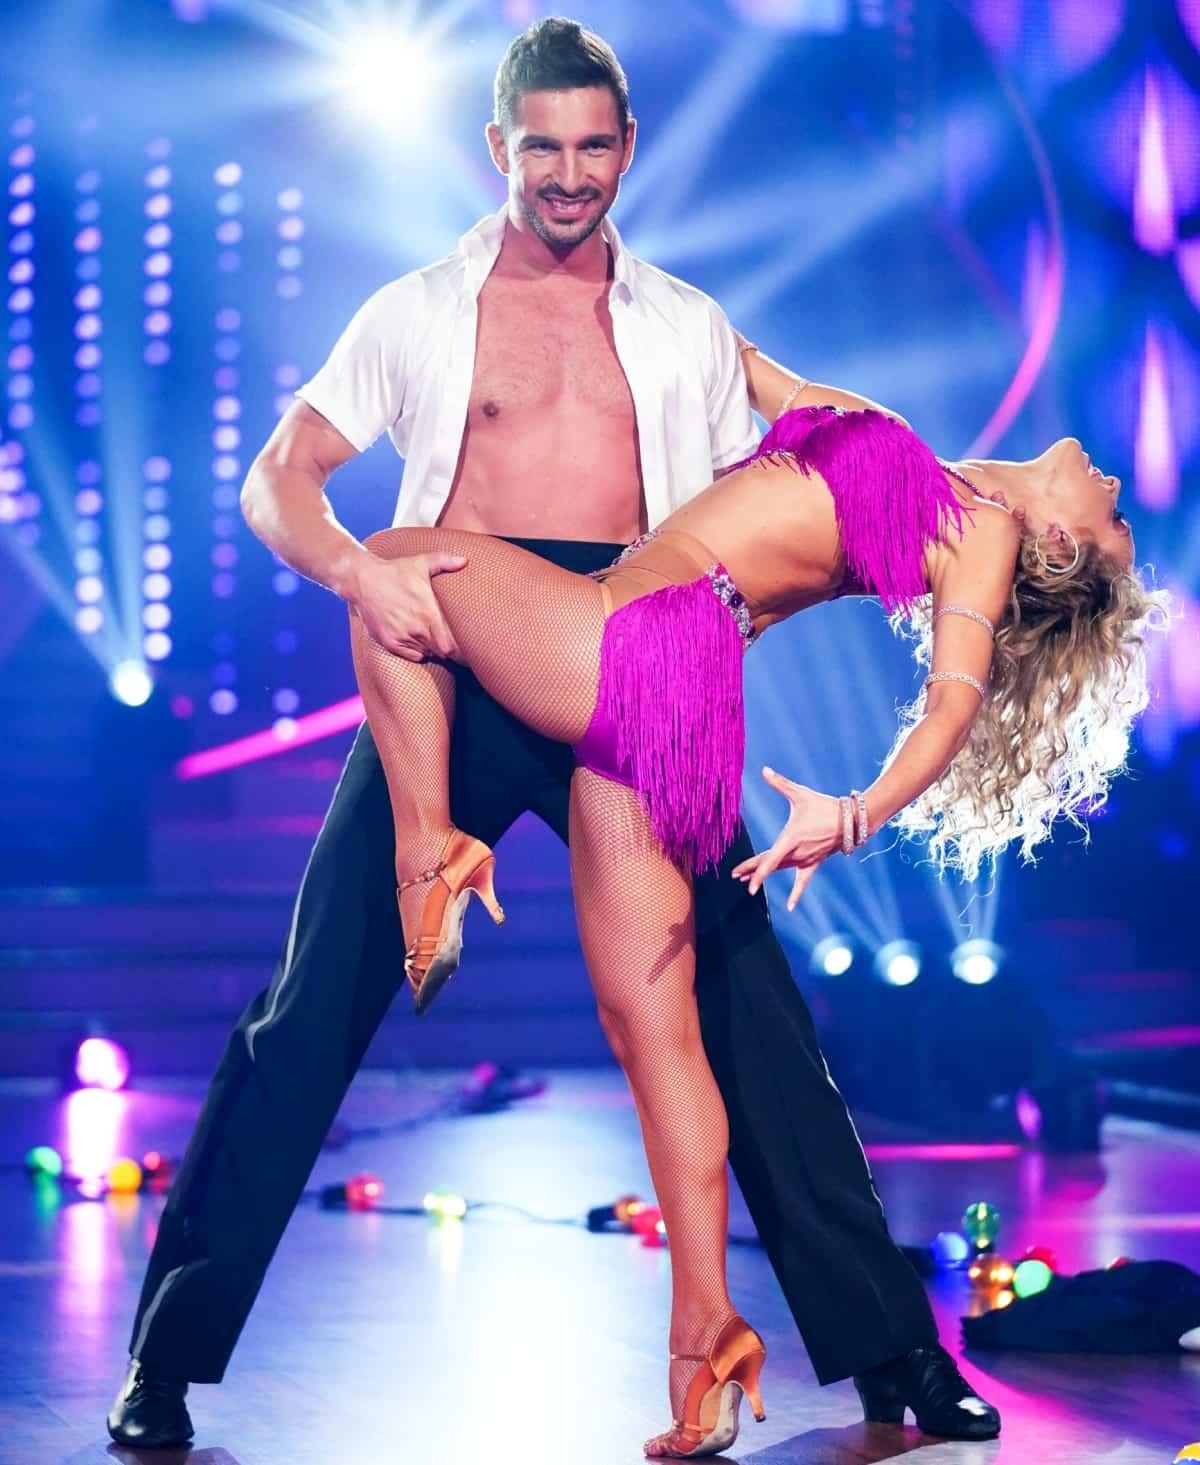 Benjamin Piwko und Isabel Edvardsson bei Let's dance am 17.5.2019